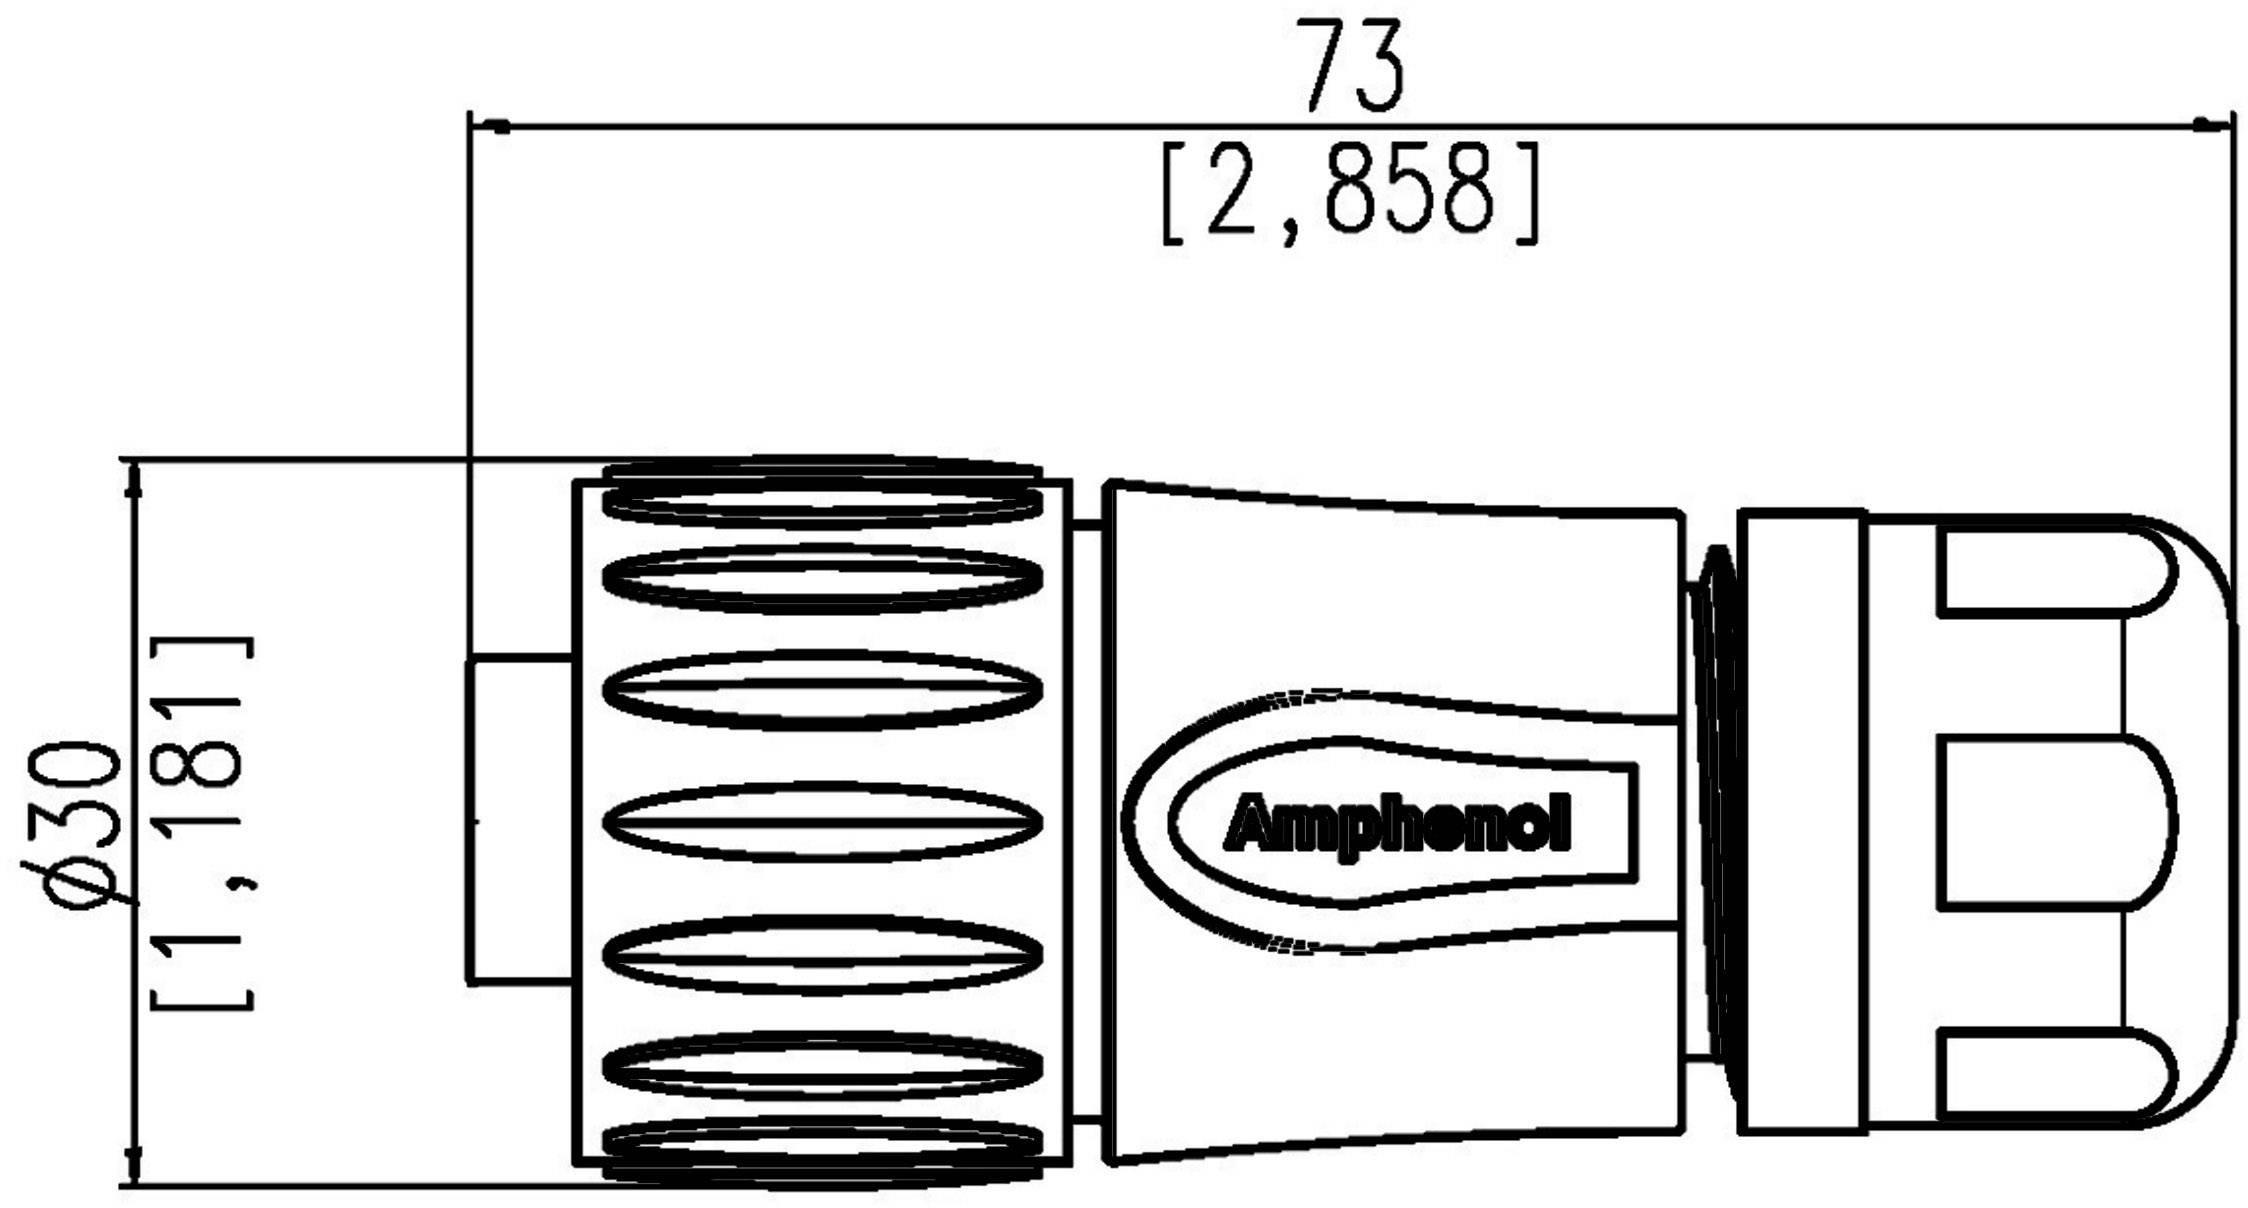 Amphenol C016 20H003 110 10 IP67 (v zablokovanom stave), polyamid 6.6, pólů + PE, 1 ks